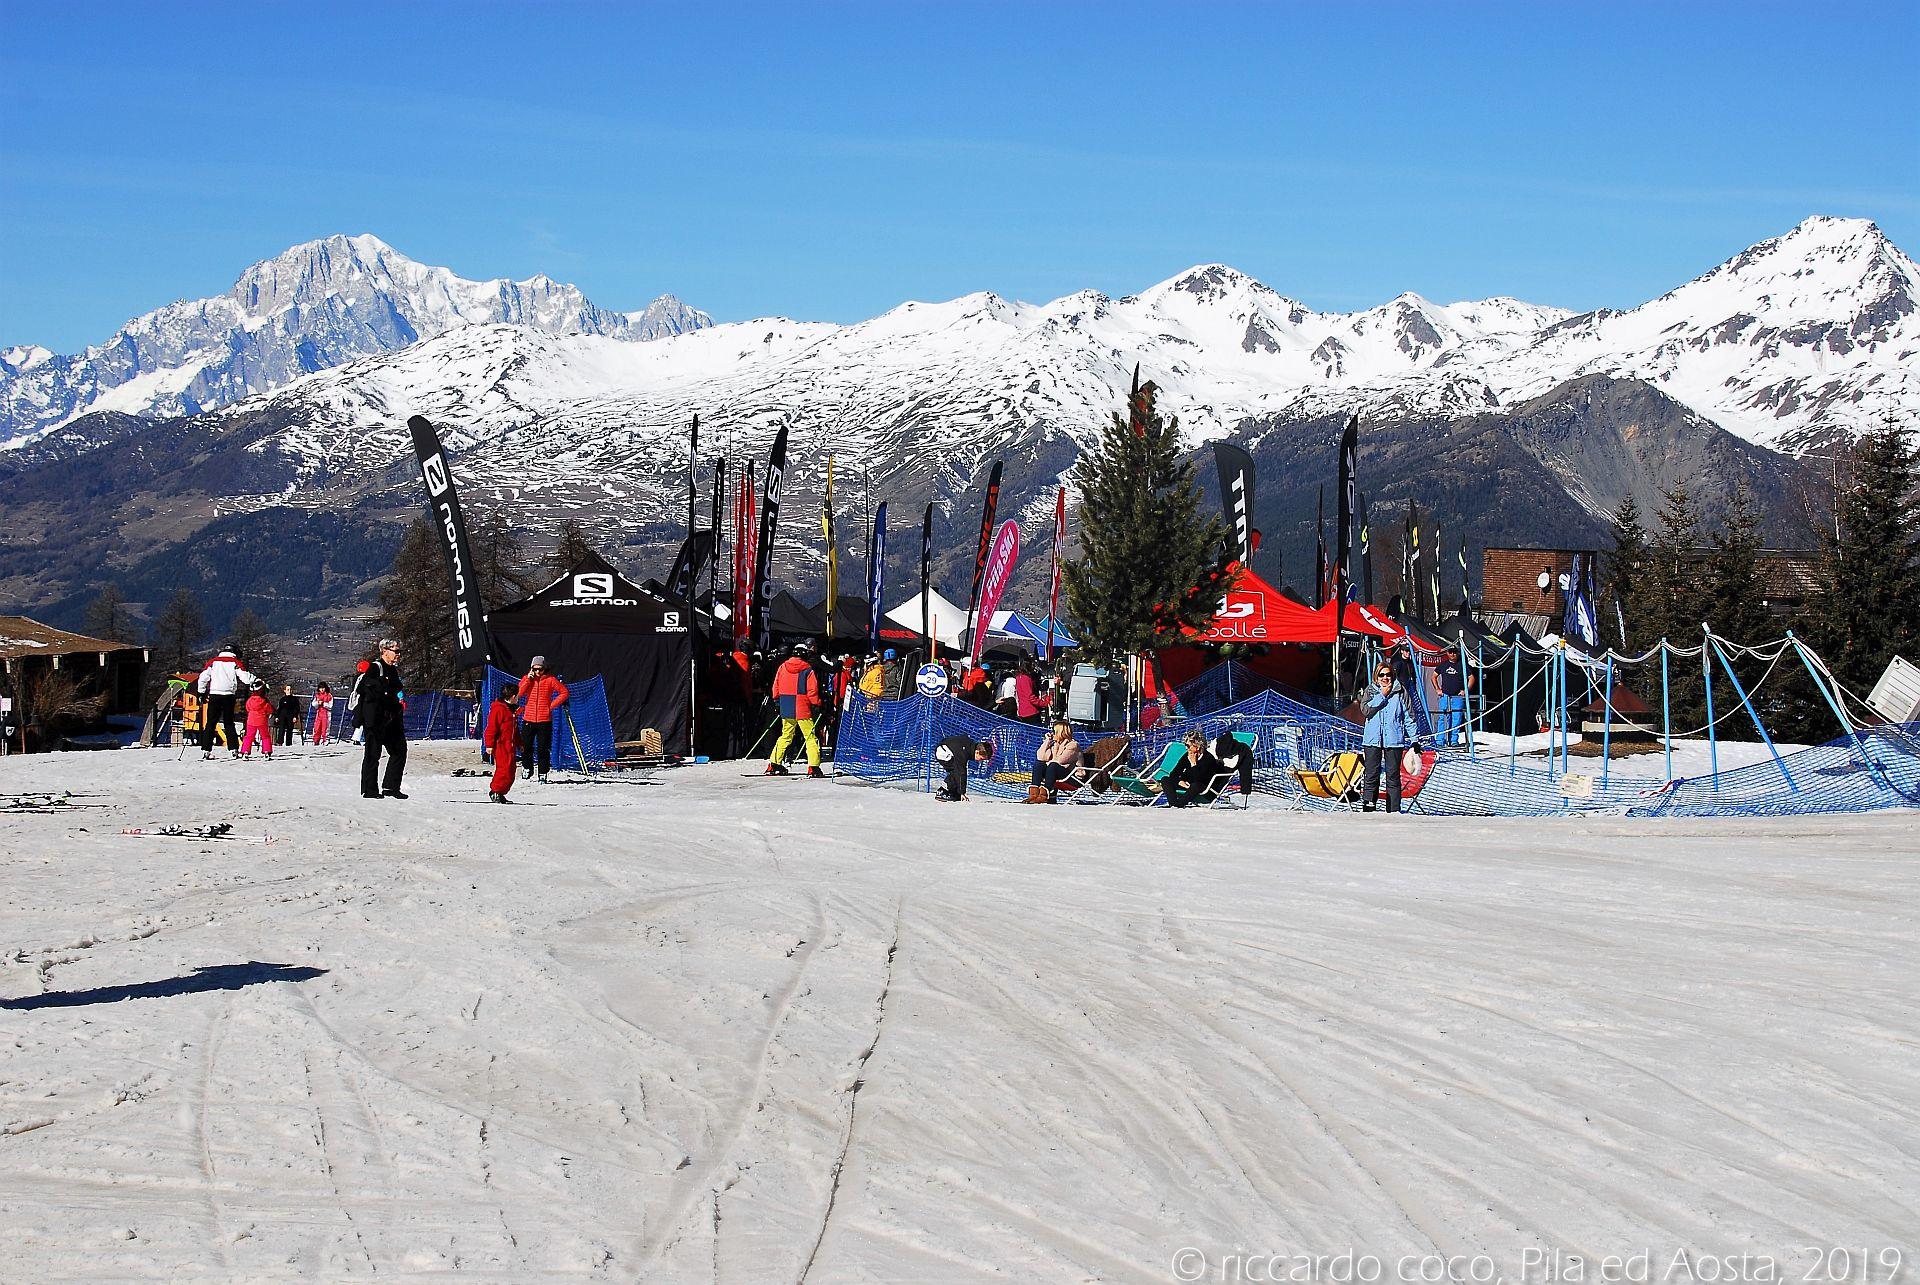 Settimana bianca 2019, Pila e Aosta